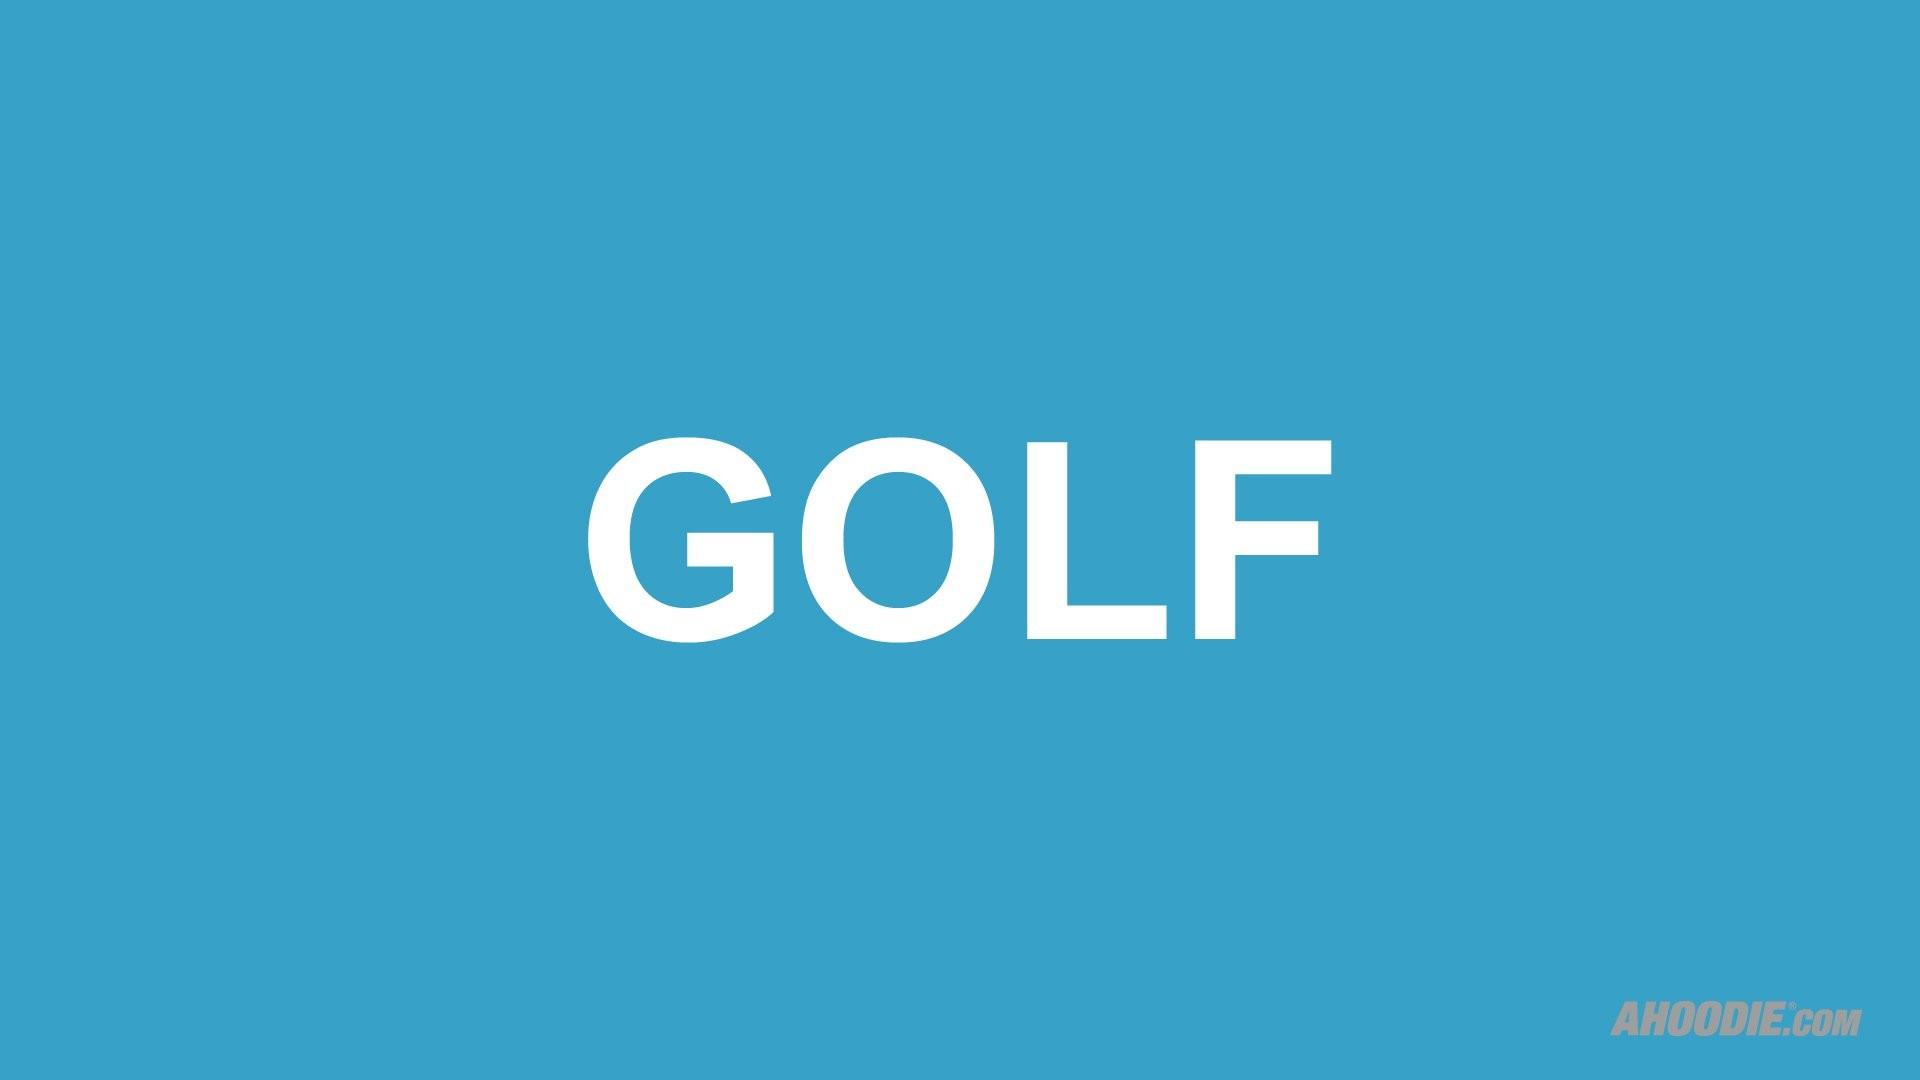 golf wang iphone wallpaper – photo #8